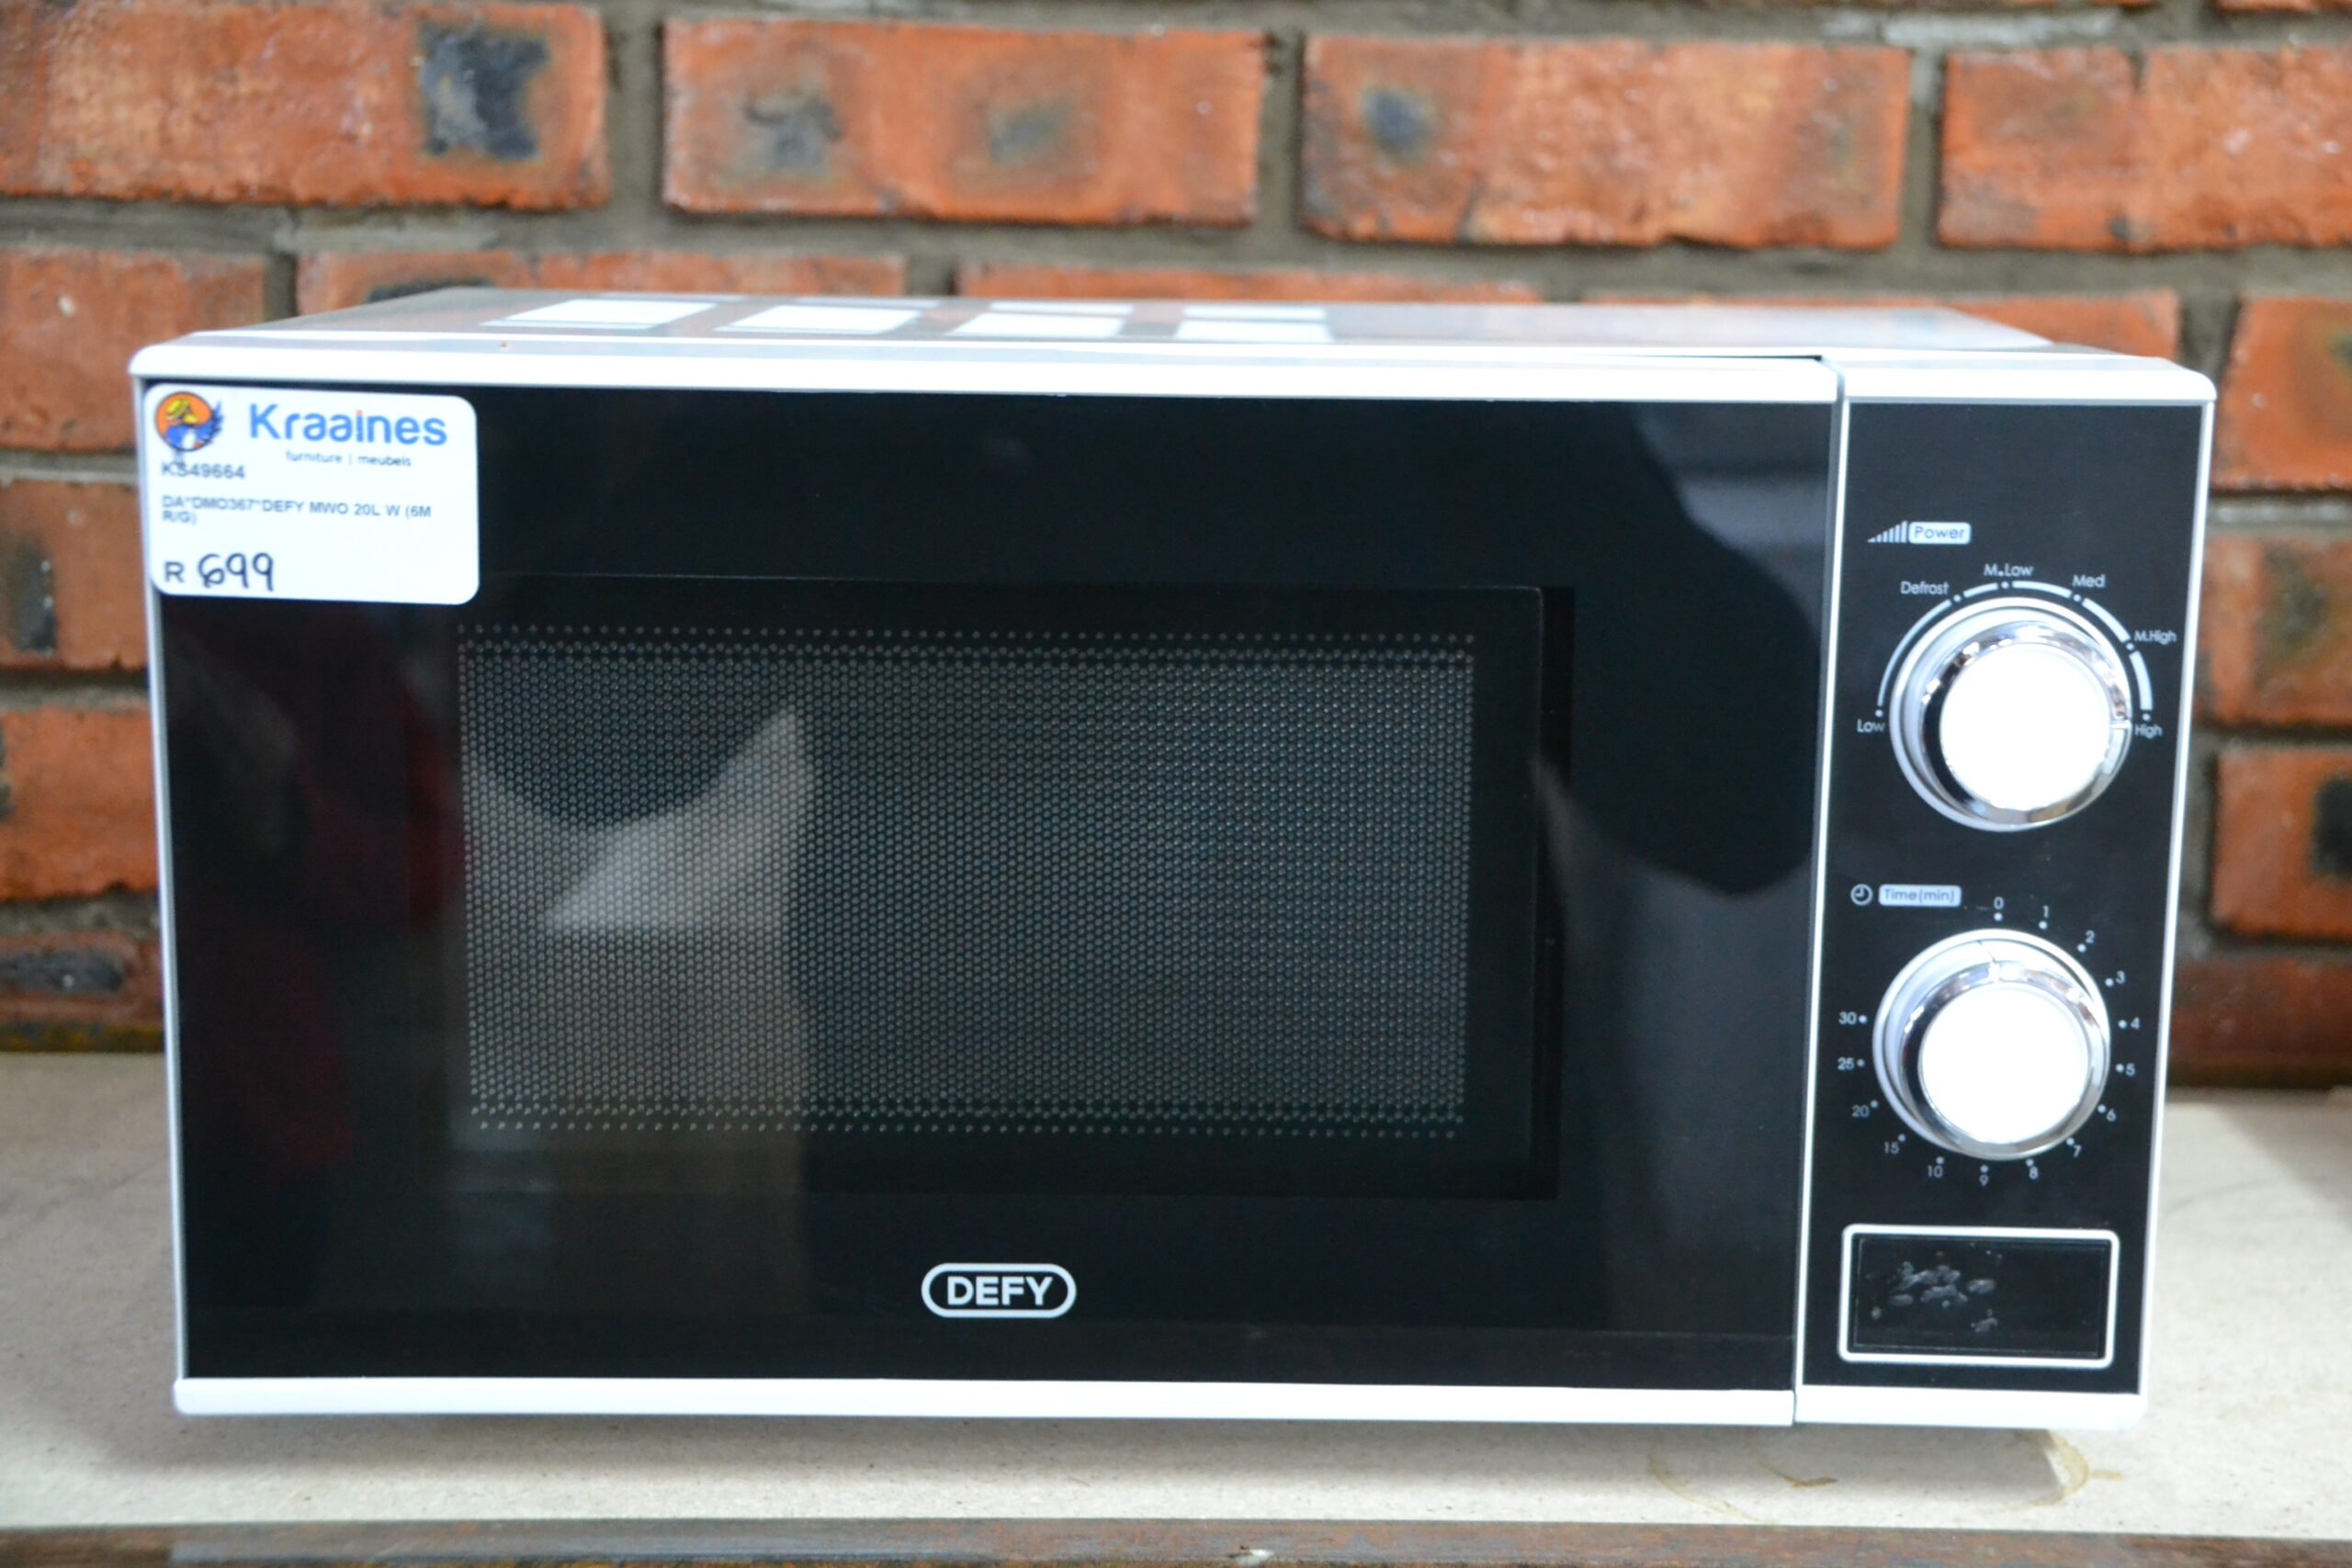 Defy 20 l Microwave 4